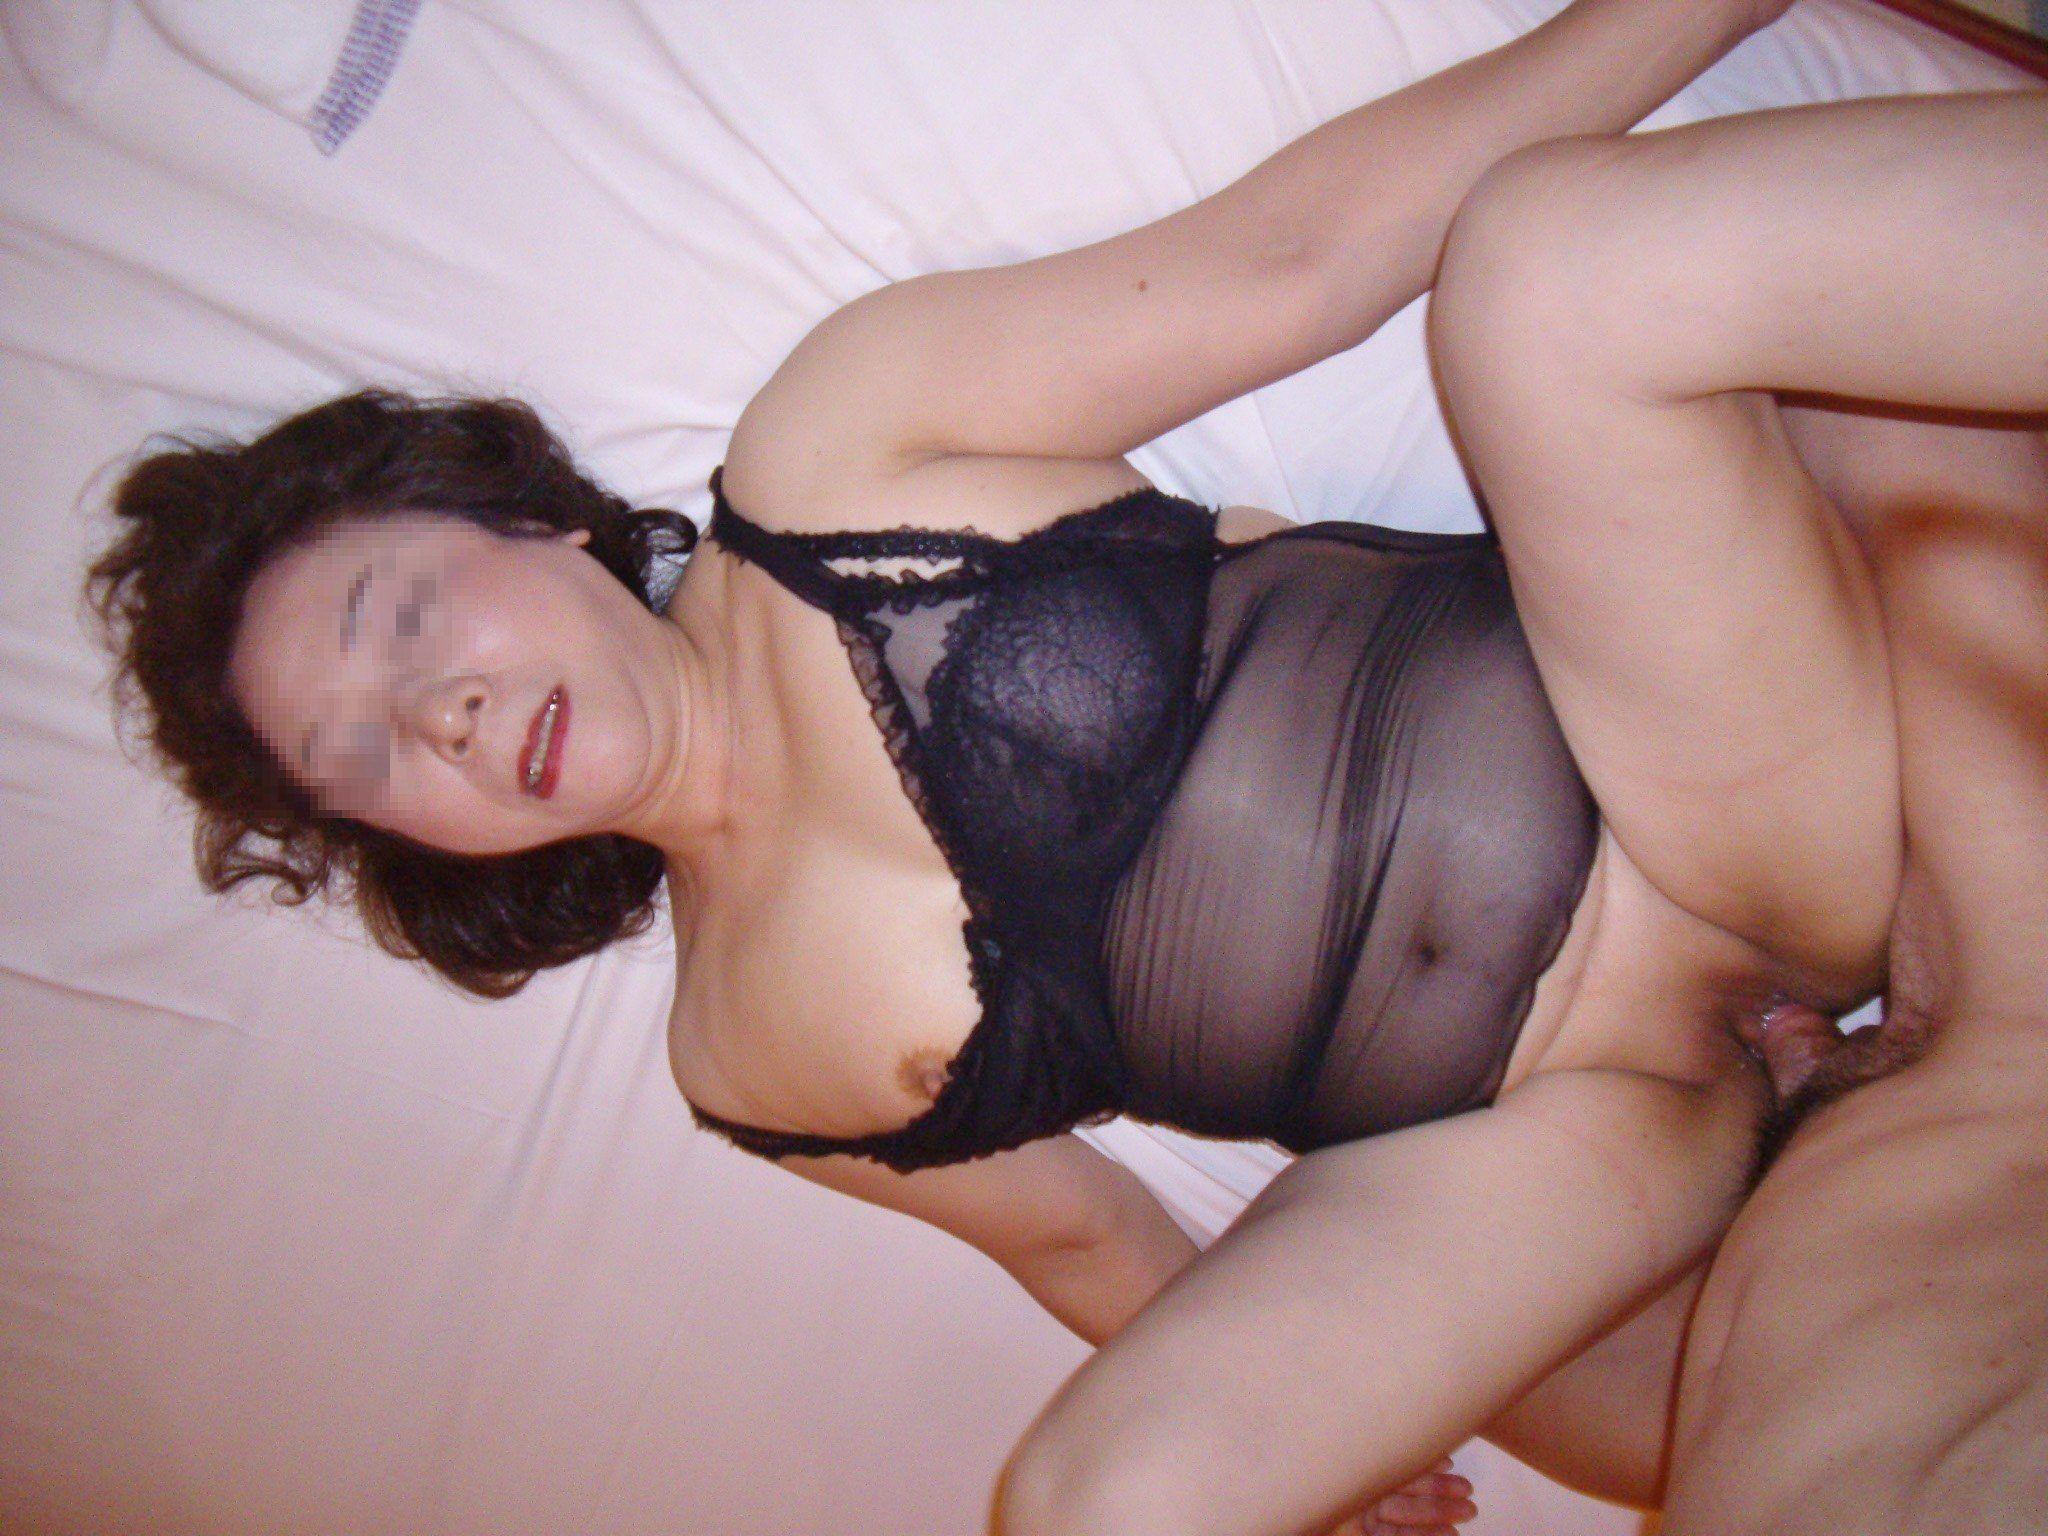 60S Plus Porn matures plus 60 porn. very hot images free site.